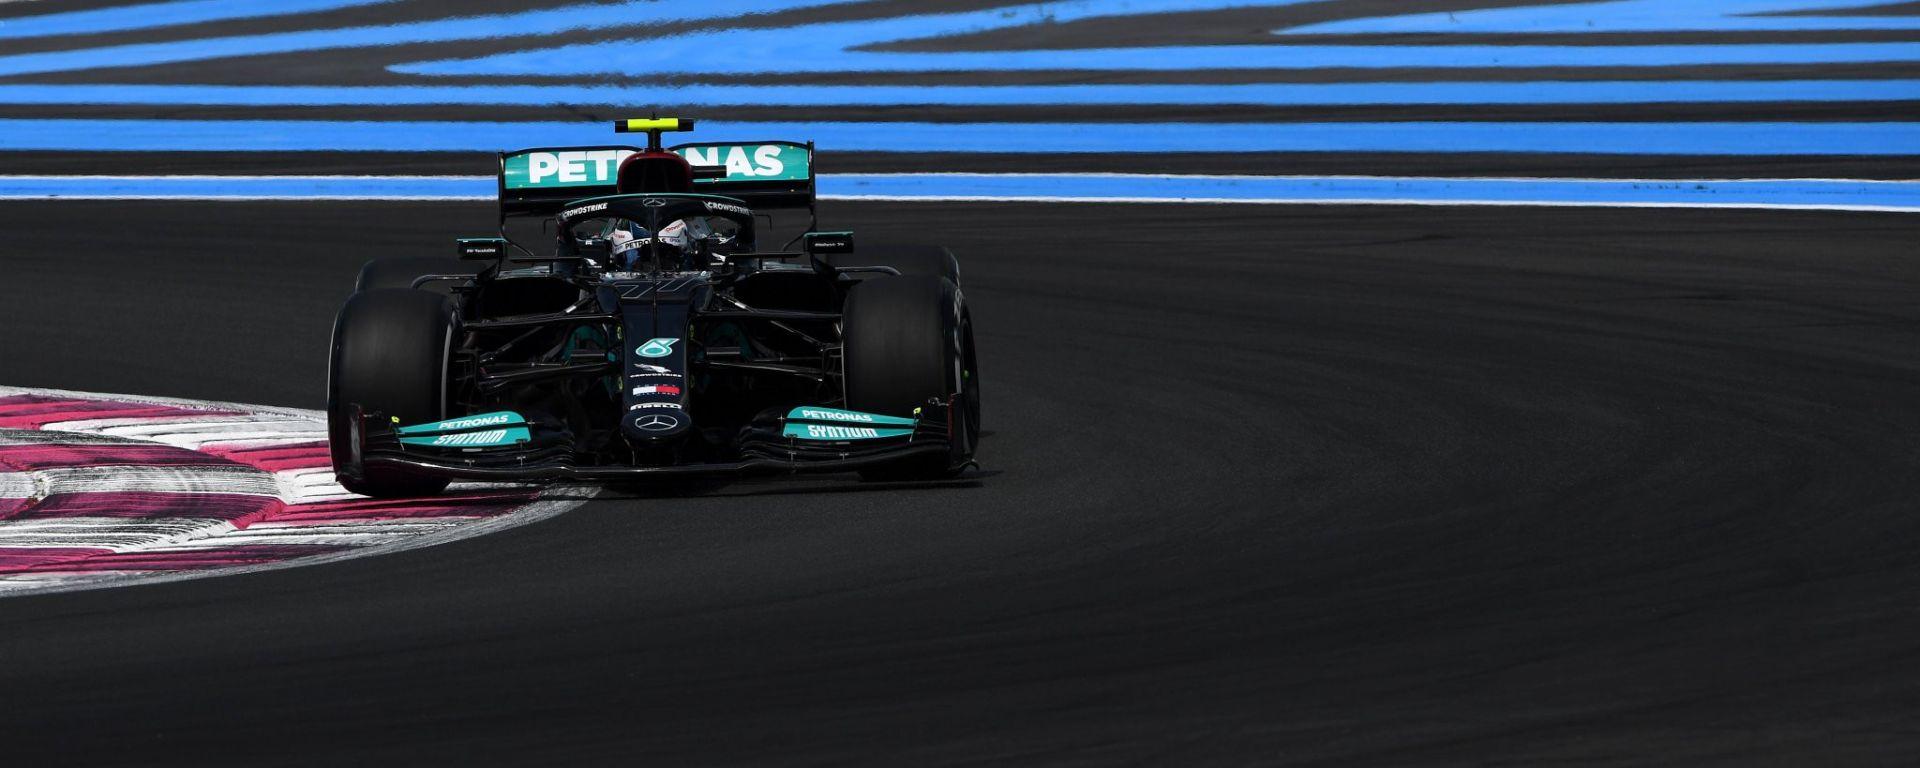 F1 GP Francia 2021, Le Castellet: Valtteri Bottas (Mercedes AMG F1)    Foto: Twitter @F1